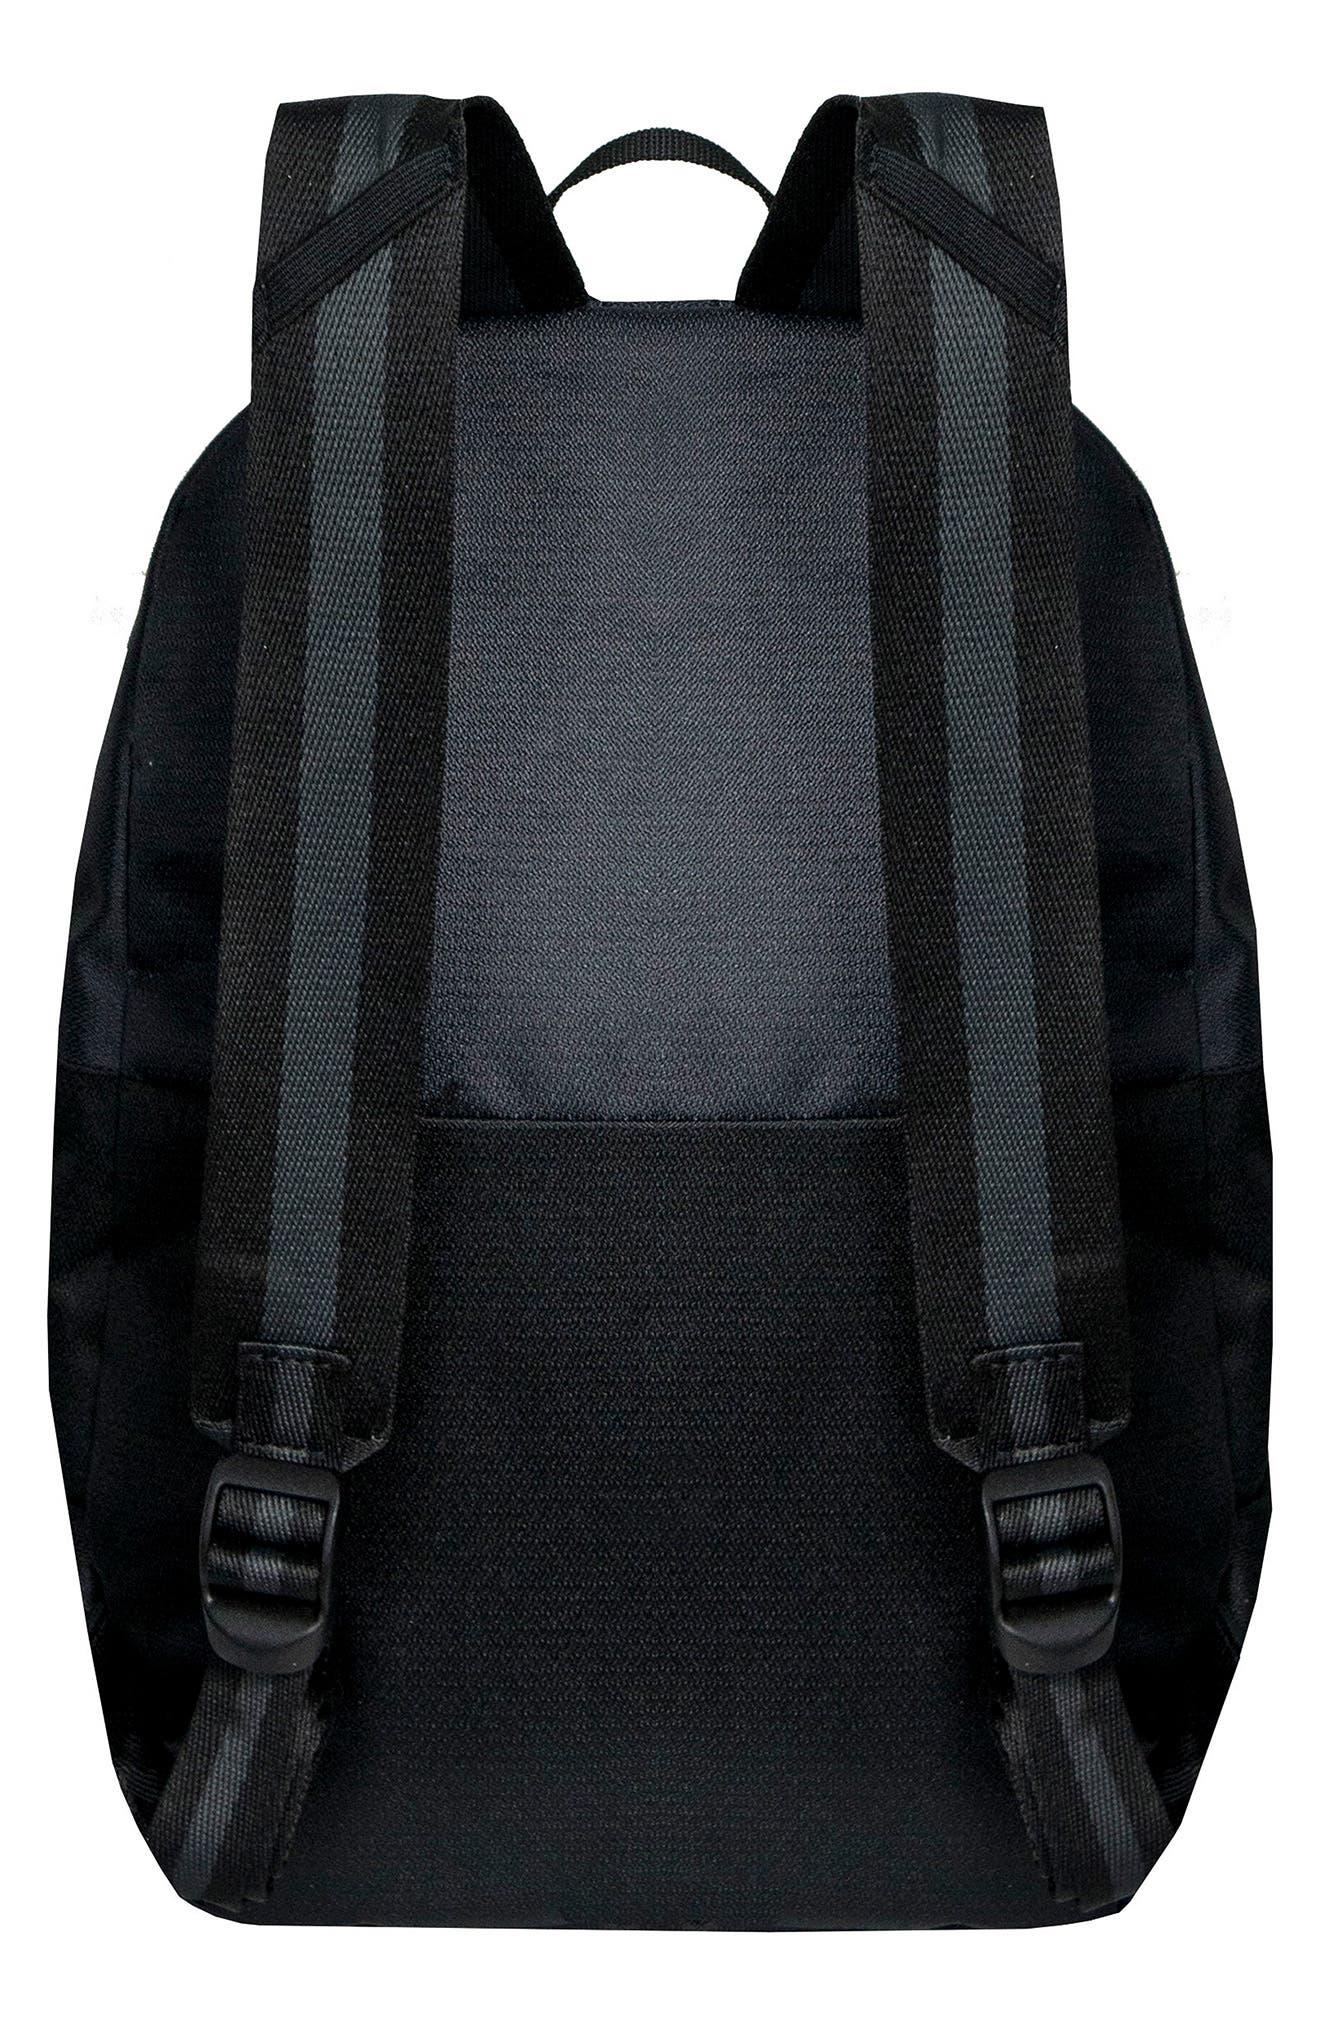 Mini Dash RFID Pocket Backpack,                             Alternate thumbnail 2, color,                             001